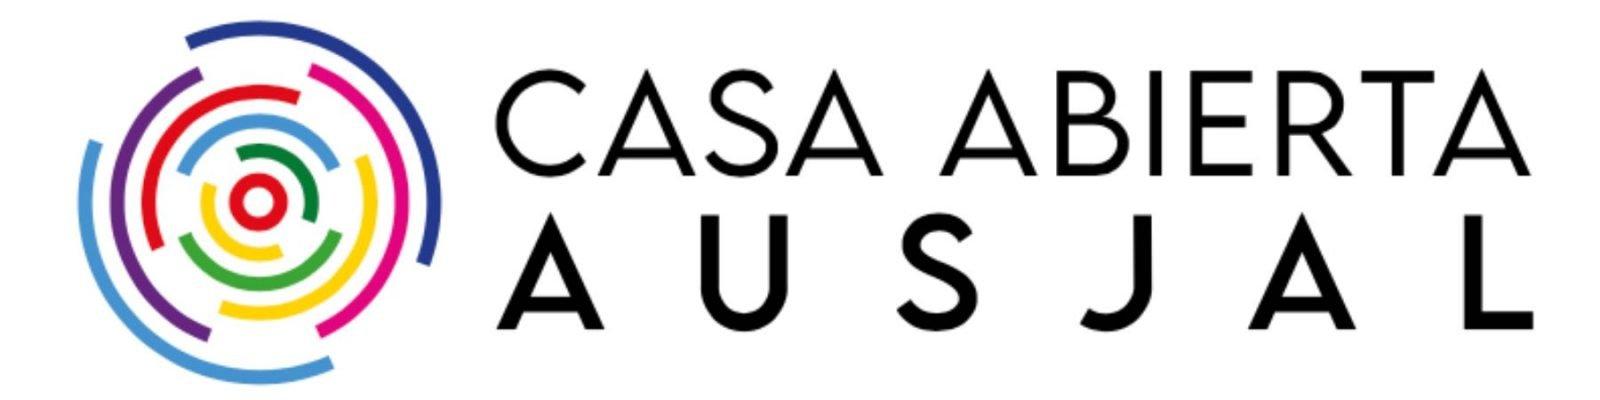 Casa Abierta AUSJAL, 2021 imagen